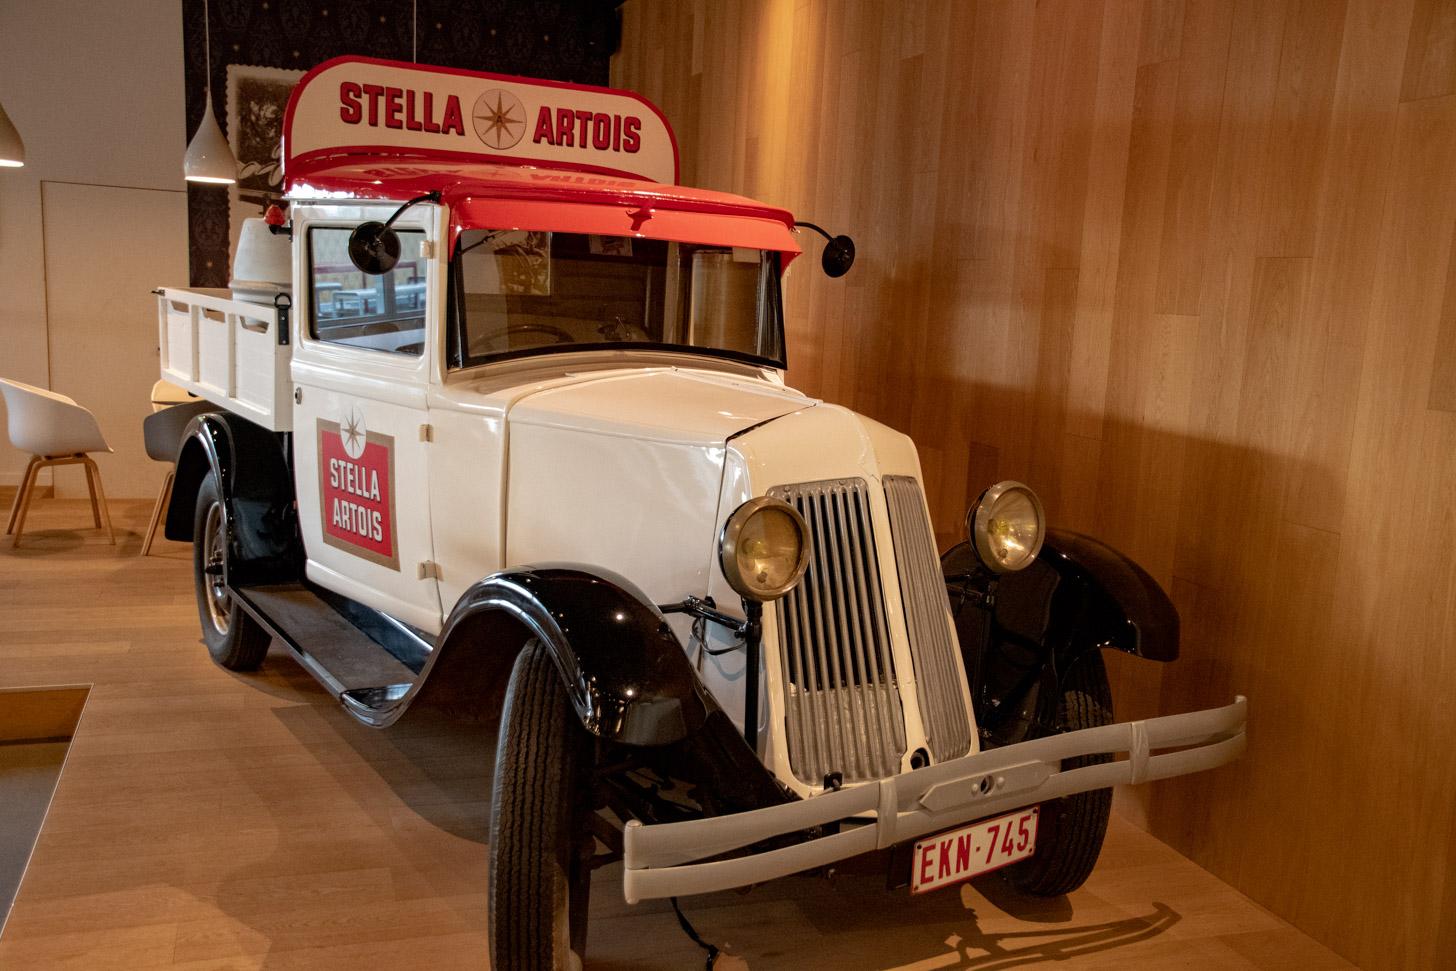 Stella Artois is een groot biermerk dat uit Leuven komt.